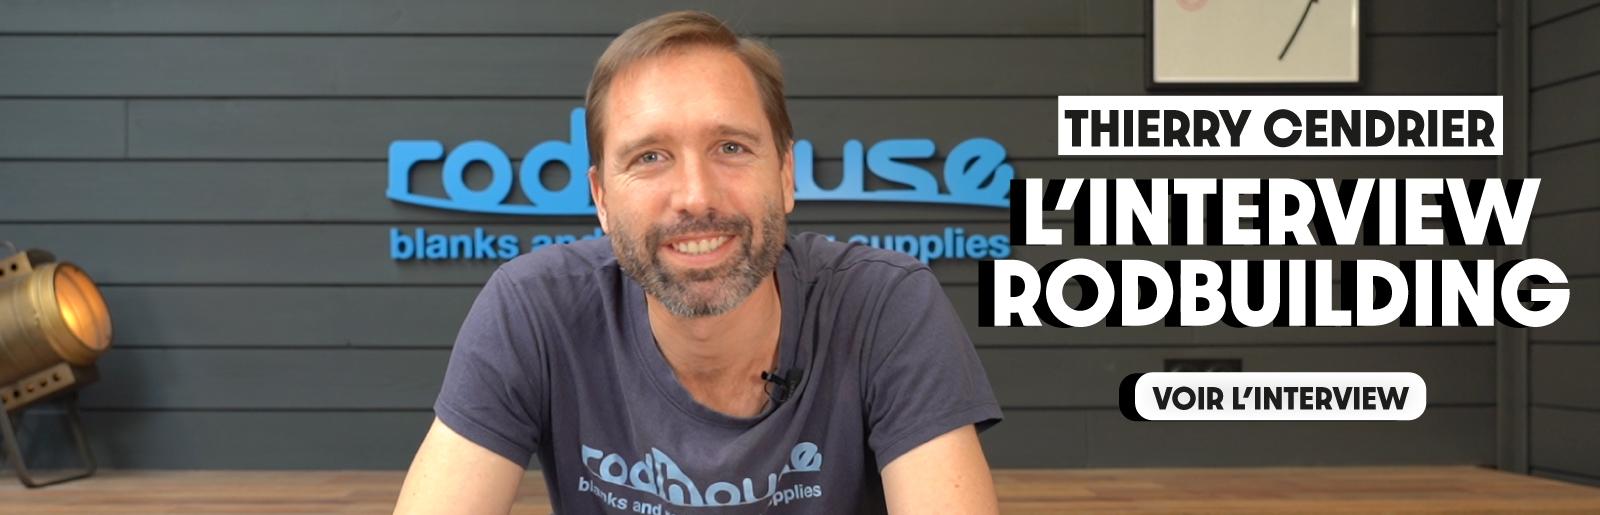 bandeau newsletter interview rodbuilding cendrier